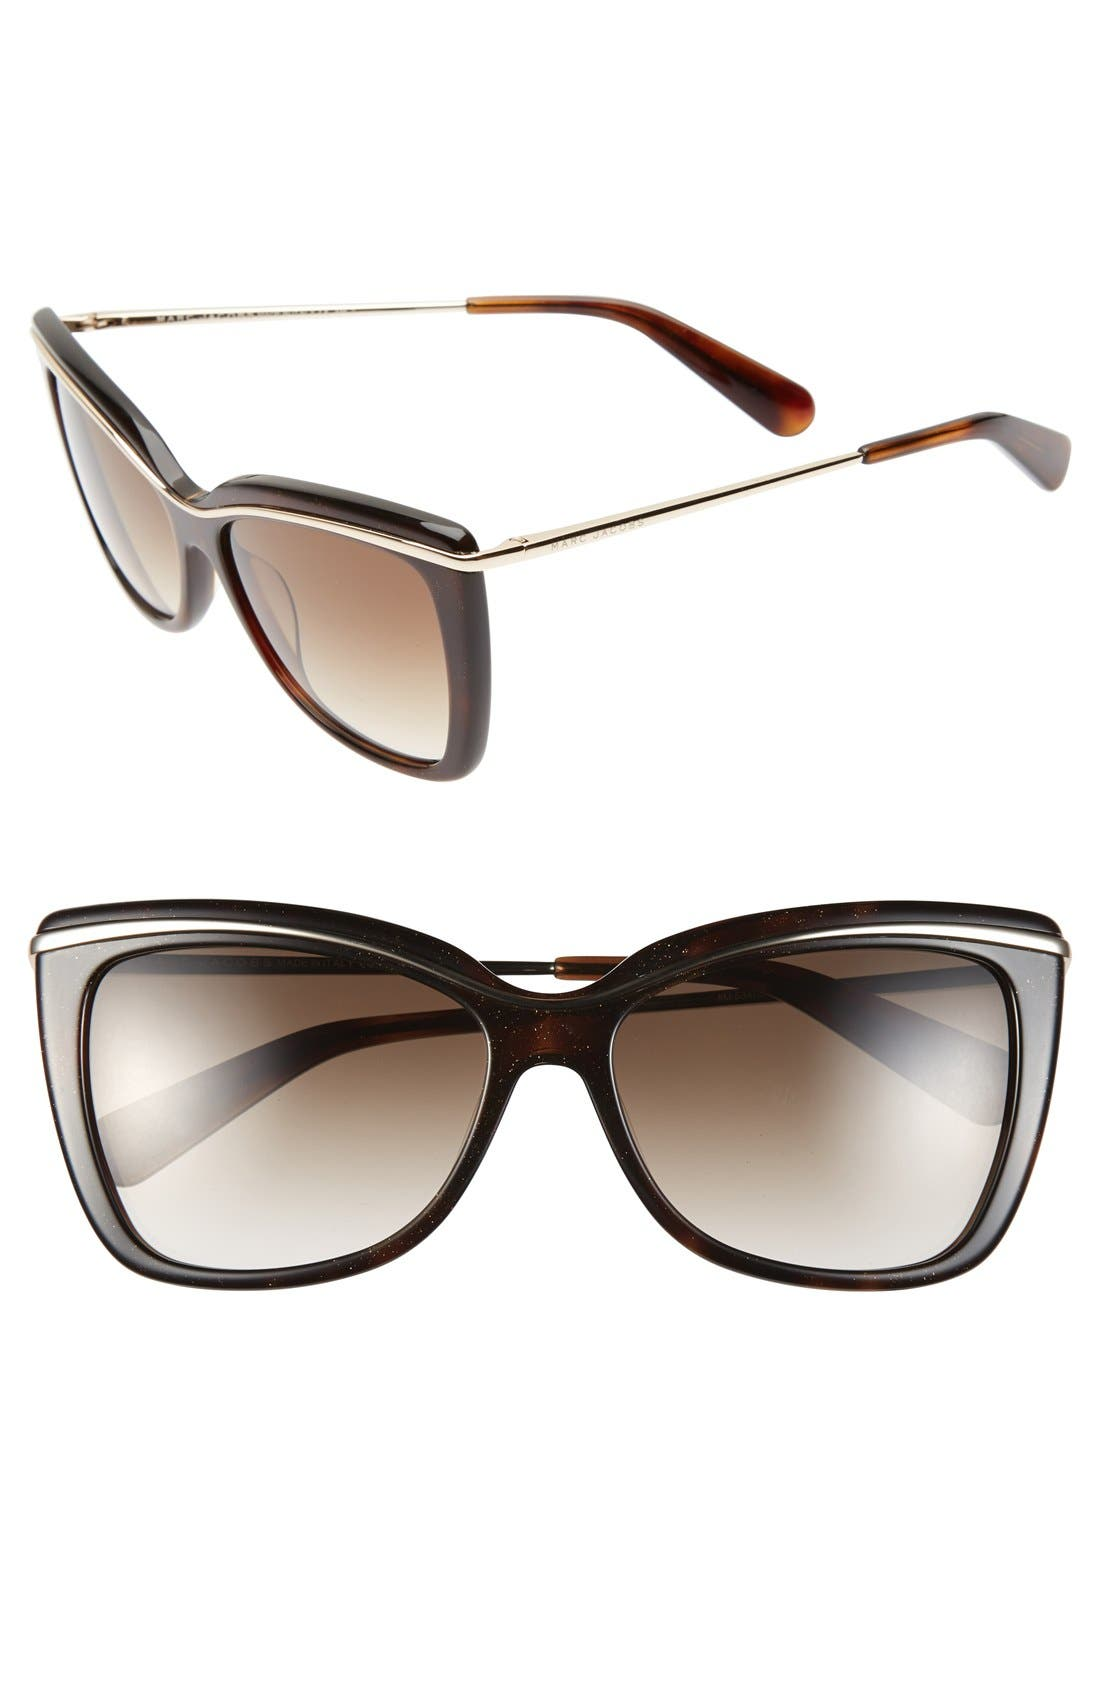 Alternate Image 1 Selected - MARC JACOBS 56mm Cat Eye Sunglasses